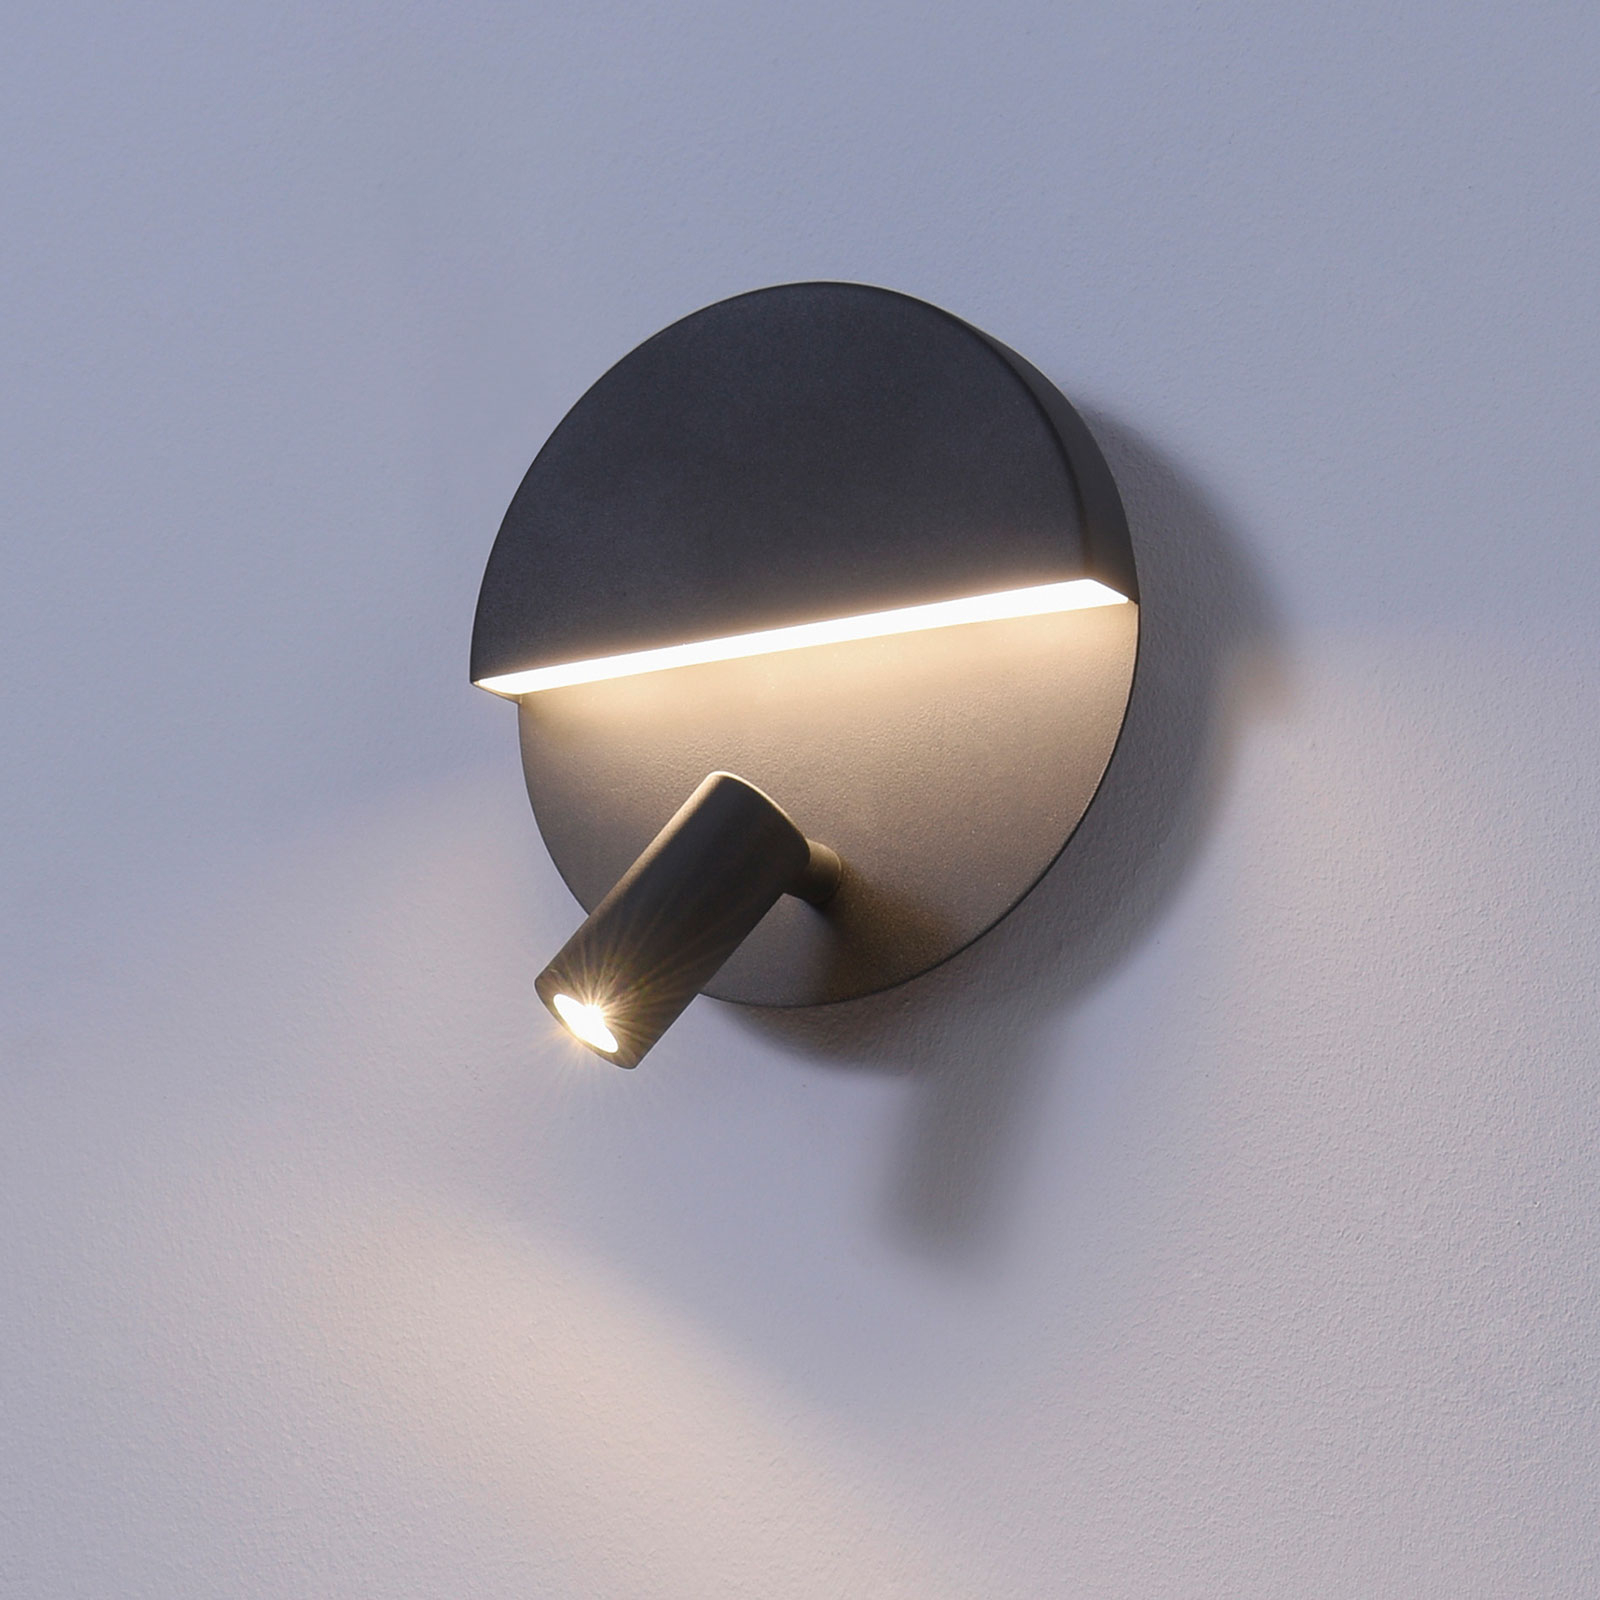 Mario LED wall light with a pivotable spotlight_9005481_1